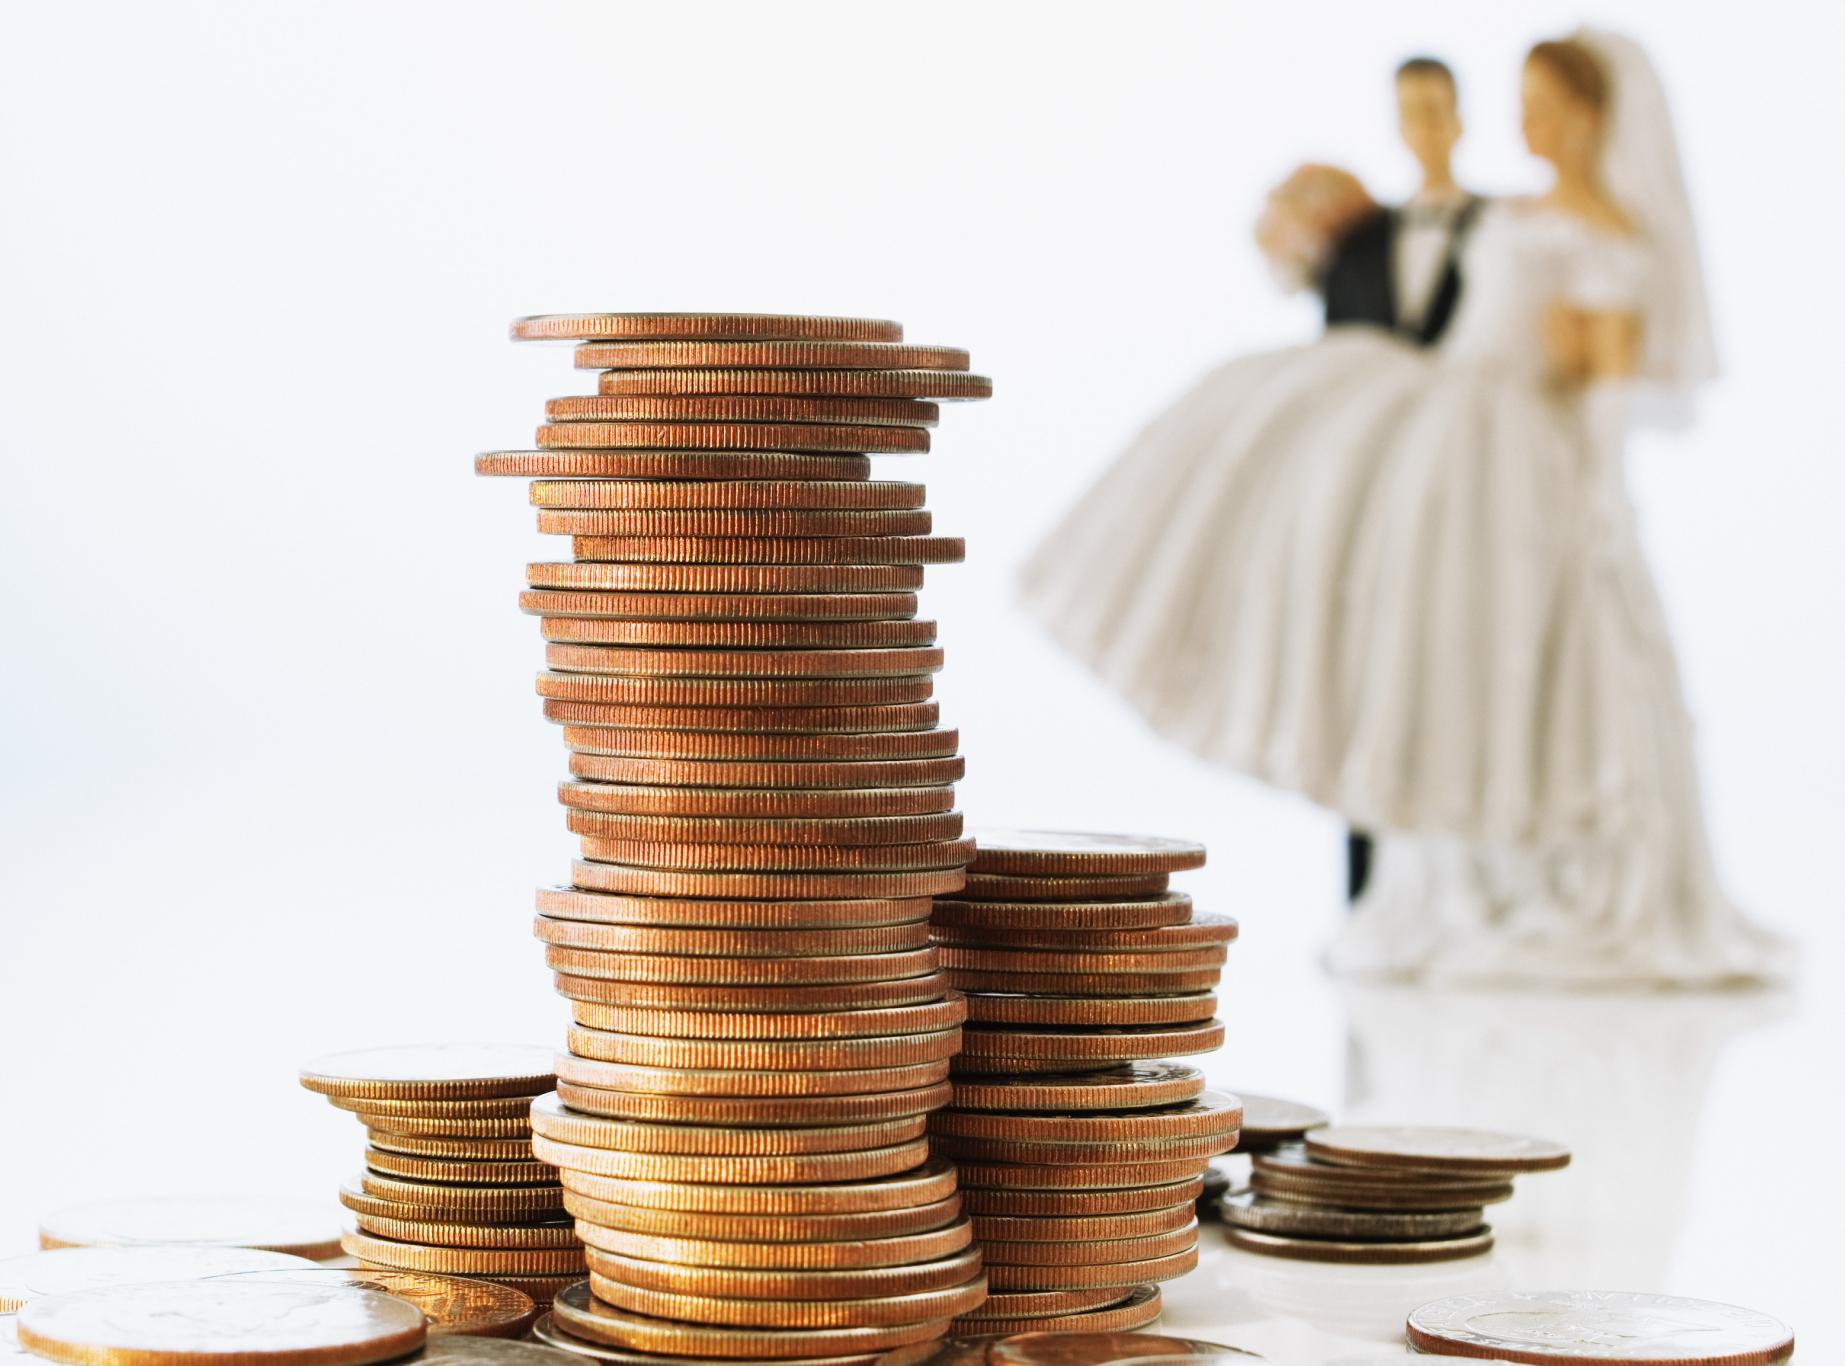 3. 4 Hal Terpenting dalam Manajemen Keuangan Pasangan Baru 2 - مراقب این اشتباهات در جشن عروسی خود باشید!